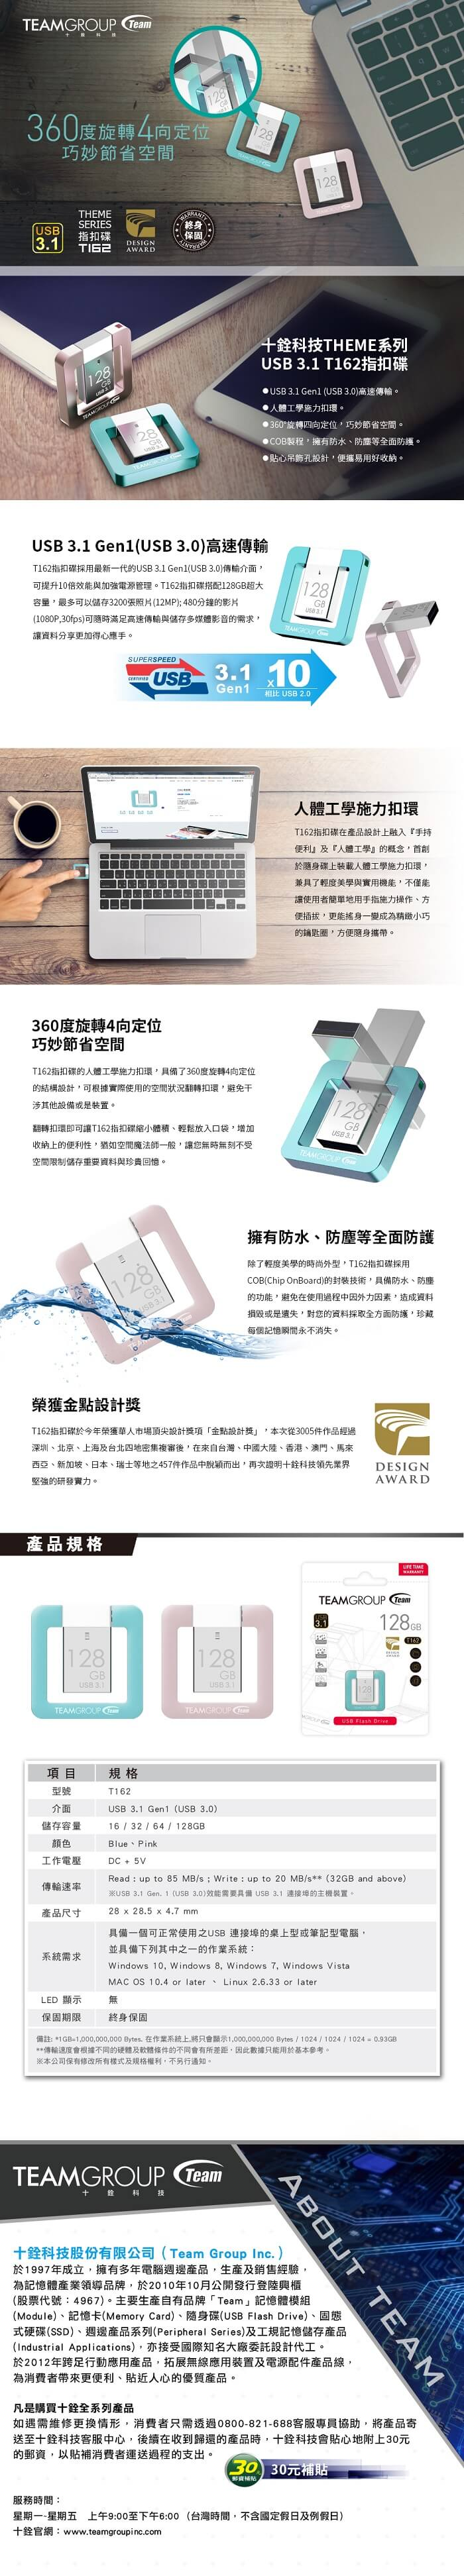 (複製)Team Group 十銓|MoStash魔立碟 Apple OTG 64GB USB3.0 支架隨身碟--玫瑰金